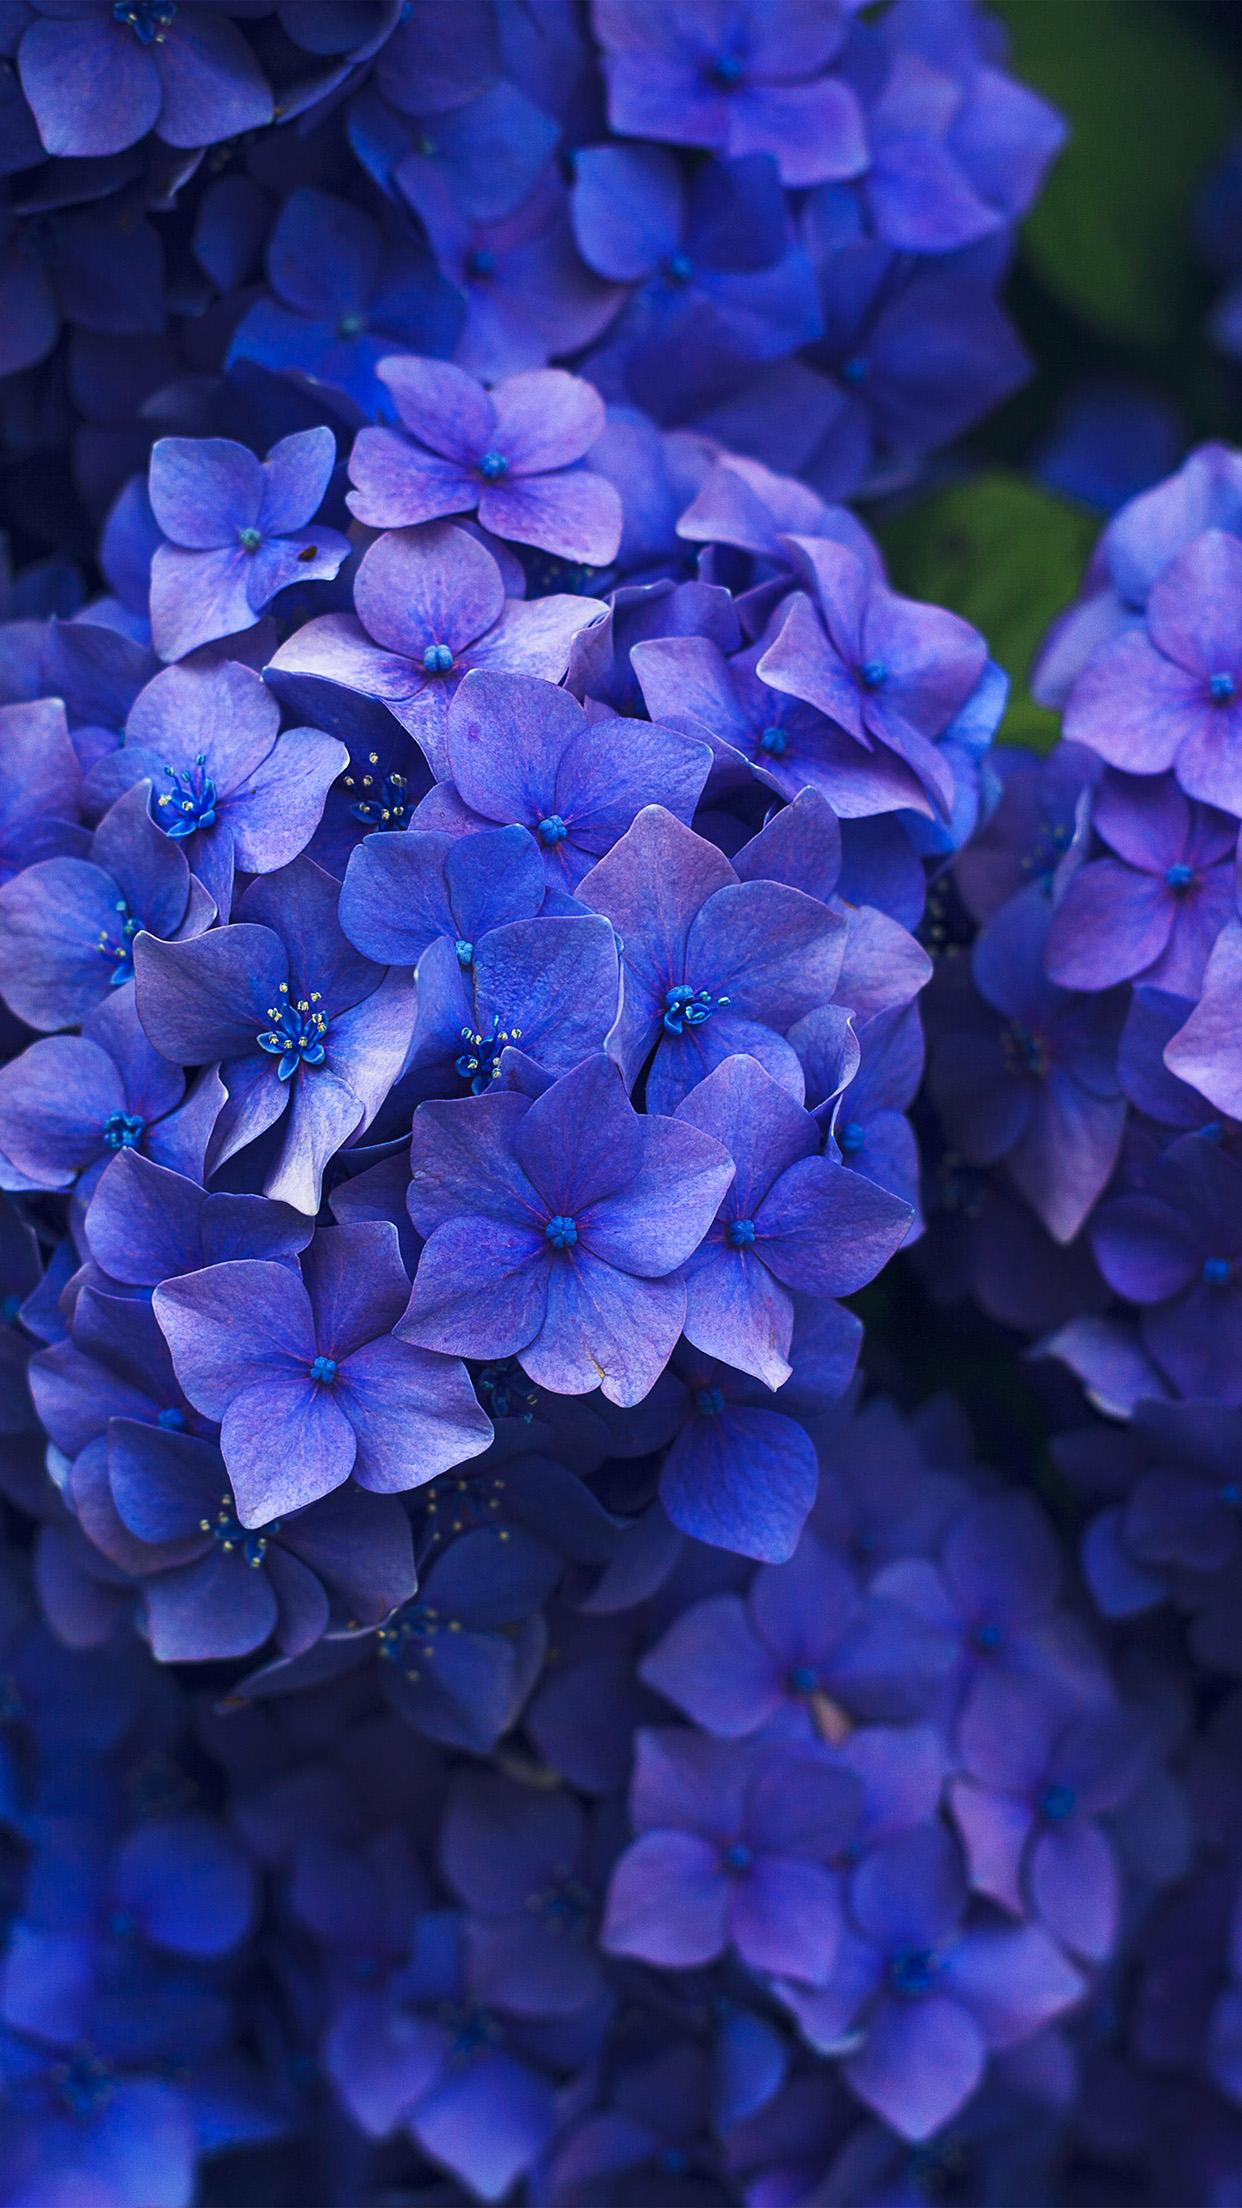 Spring Iphone 6 Wallpaper Nr08 Flower Spring Blue Purple Nature Wallpaper